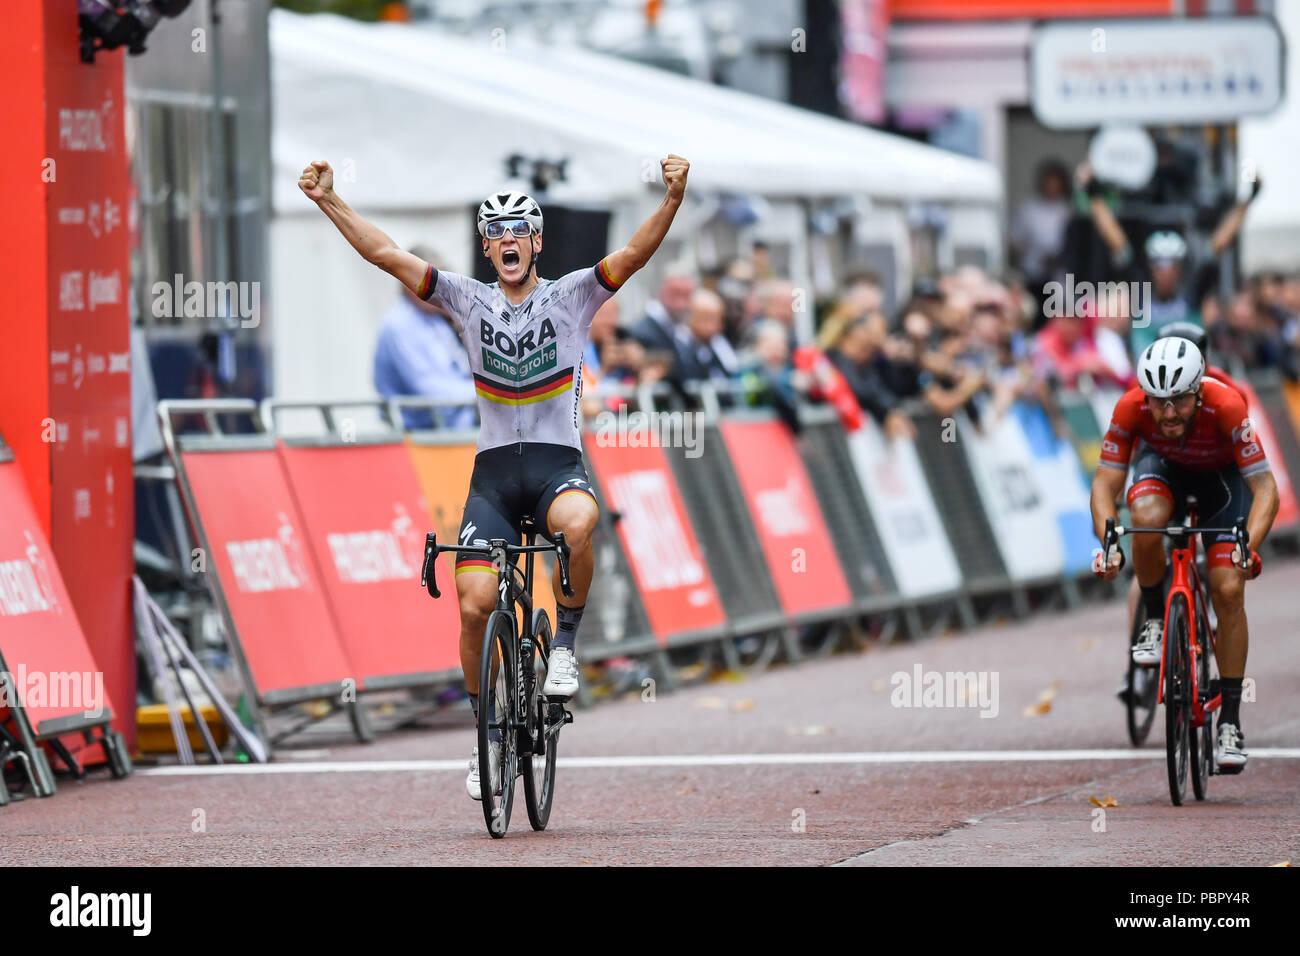 London, UK, 29 July 2018. Pascal Ackermann of Bora - Hansgrohe / Germany National Champion wins the Prudential RideLondon Surrey Classic 2018 on Sunday, July 29, 2018, LONDON ENGLAND: Photo : Taka G Wu Credit: Taka Wu/Alamy Live News - Stock Image